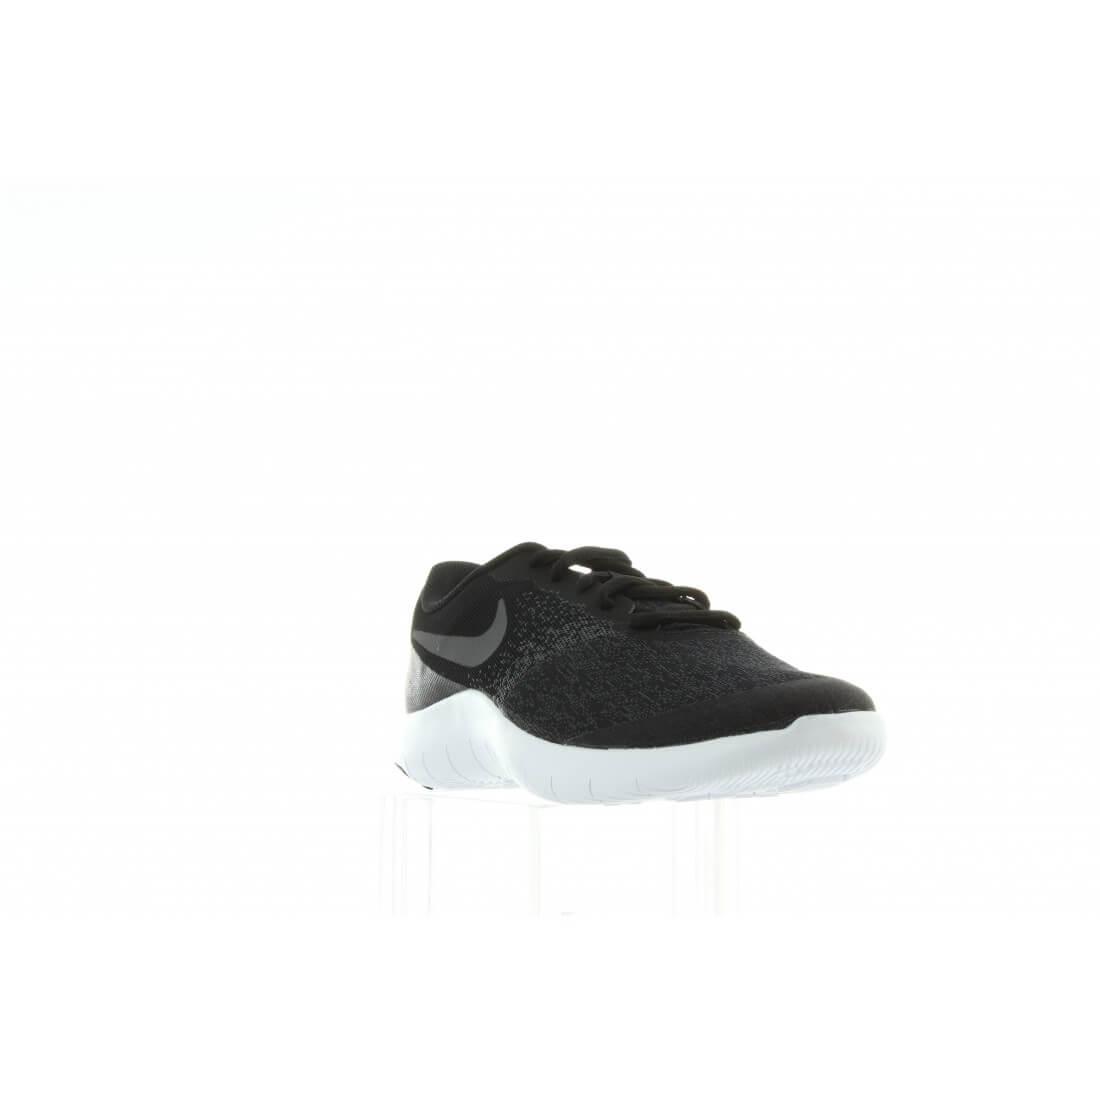 fce7ab1a29911 Buty Nike Flex Contact GS 917932 002